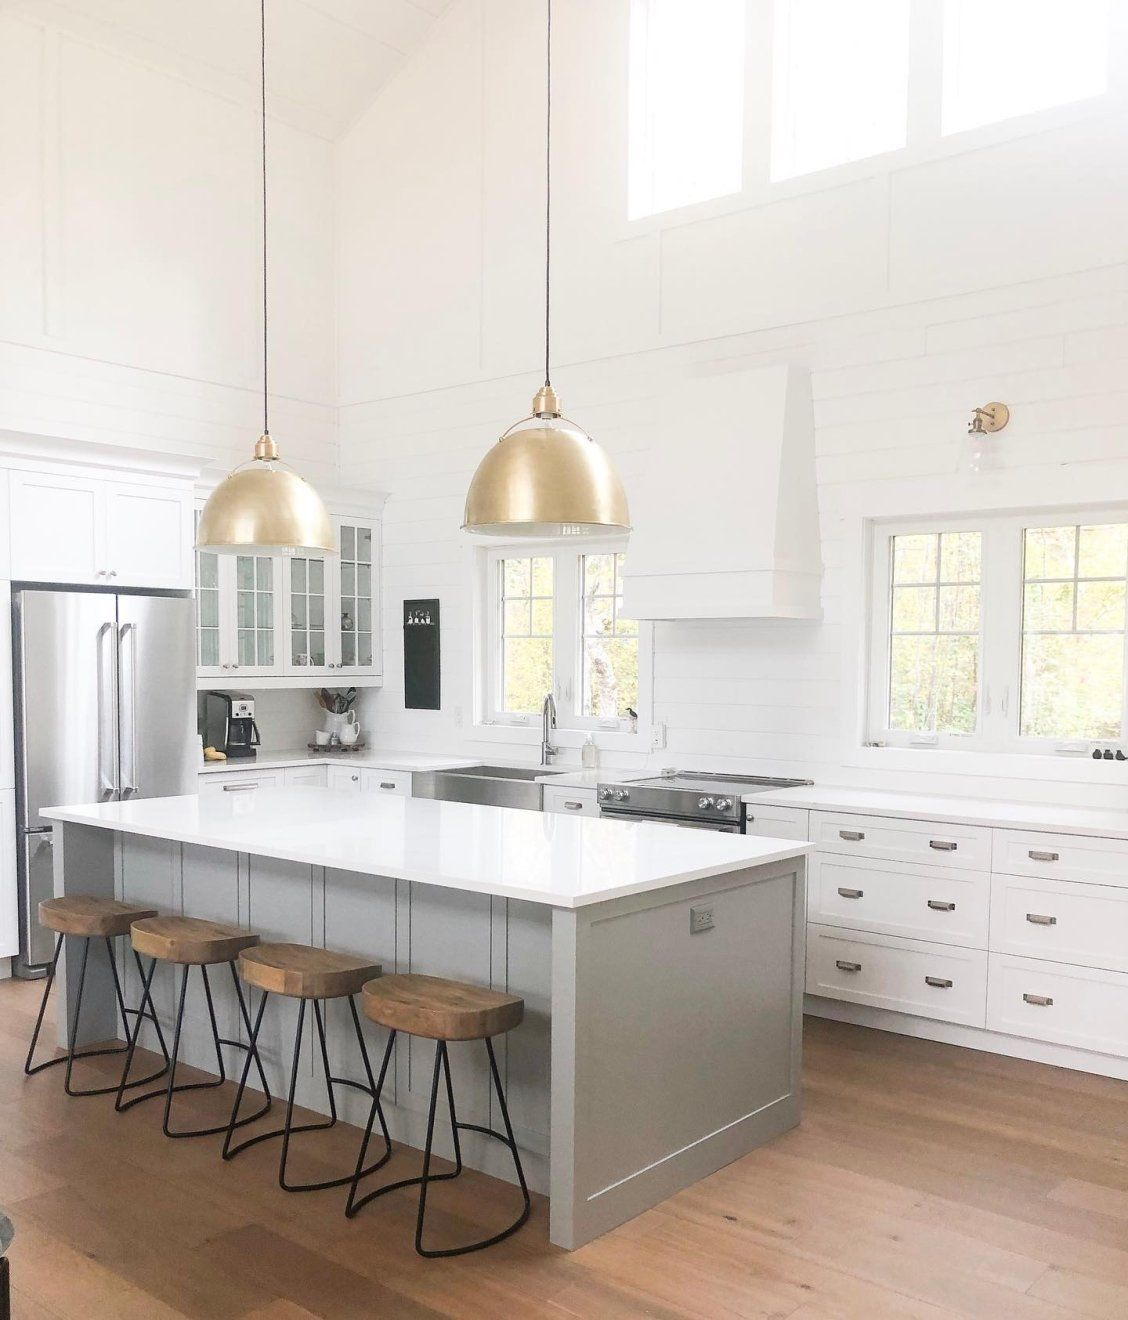 Eugene Pendants By Visual Comfort Via Linsdaypaigemcleod On Instagram For Loveyourlumens Desig Kitchen Design White Kitchen Design Kitchen Lighting Design